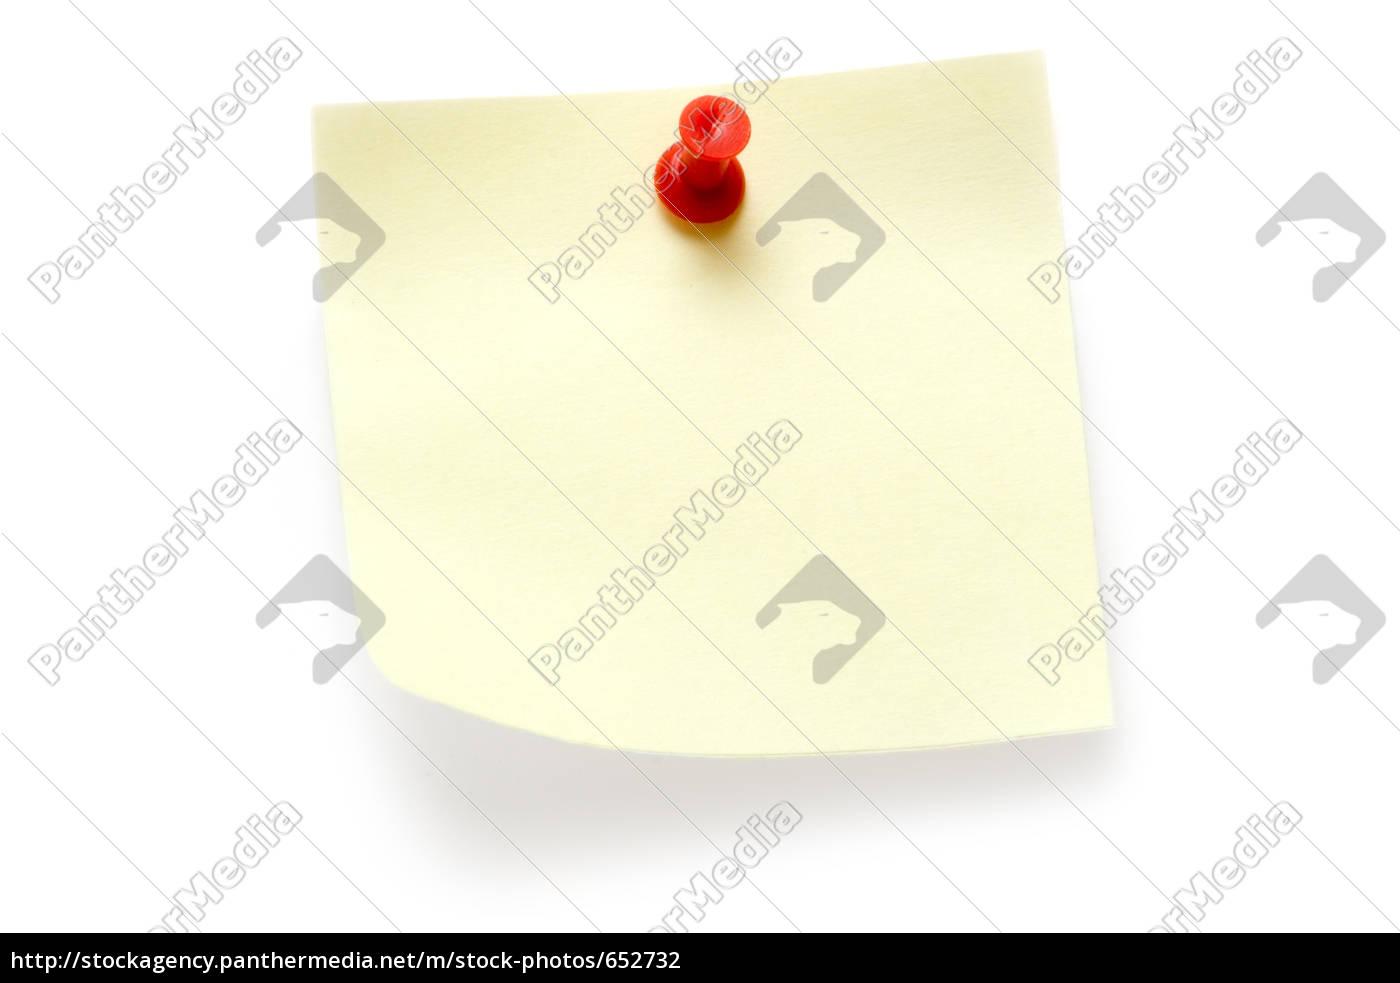 yellow, sticky, note - 652732